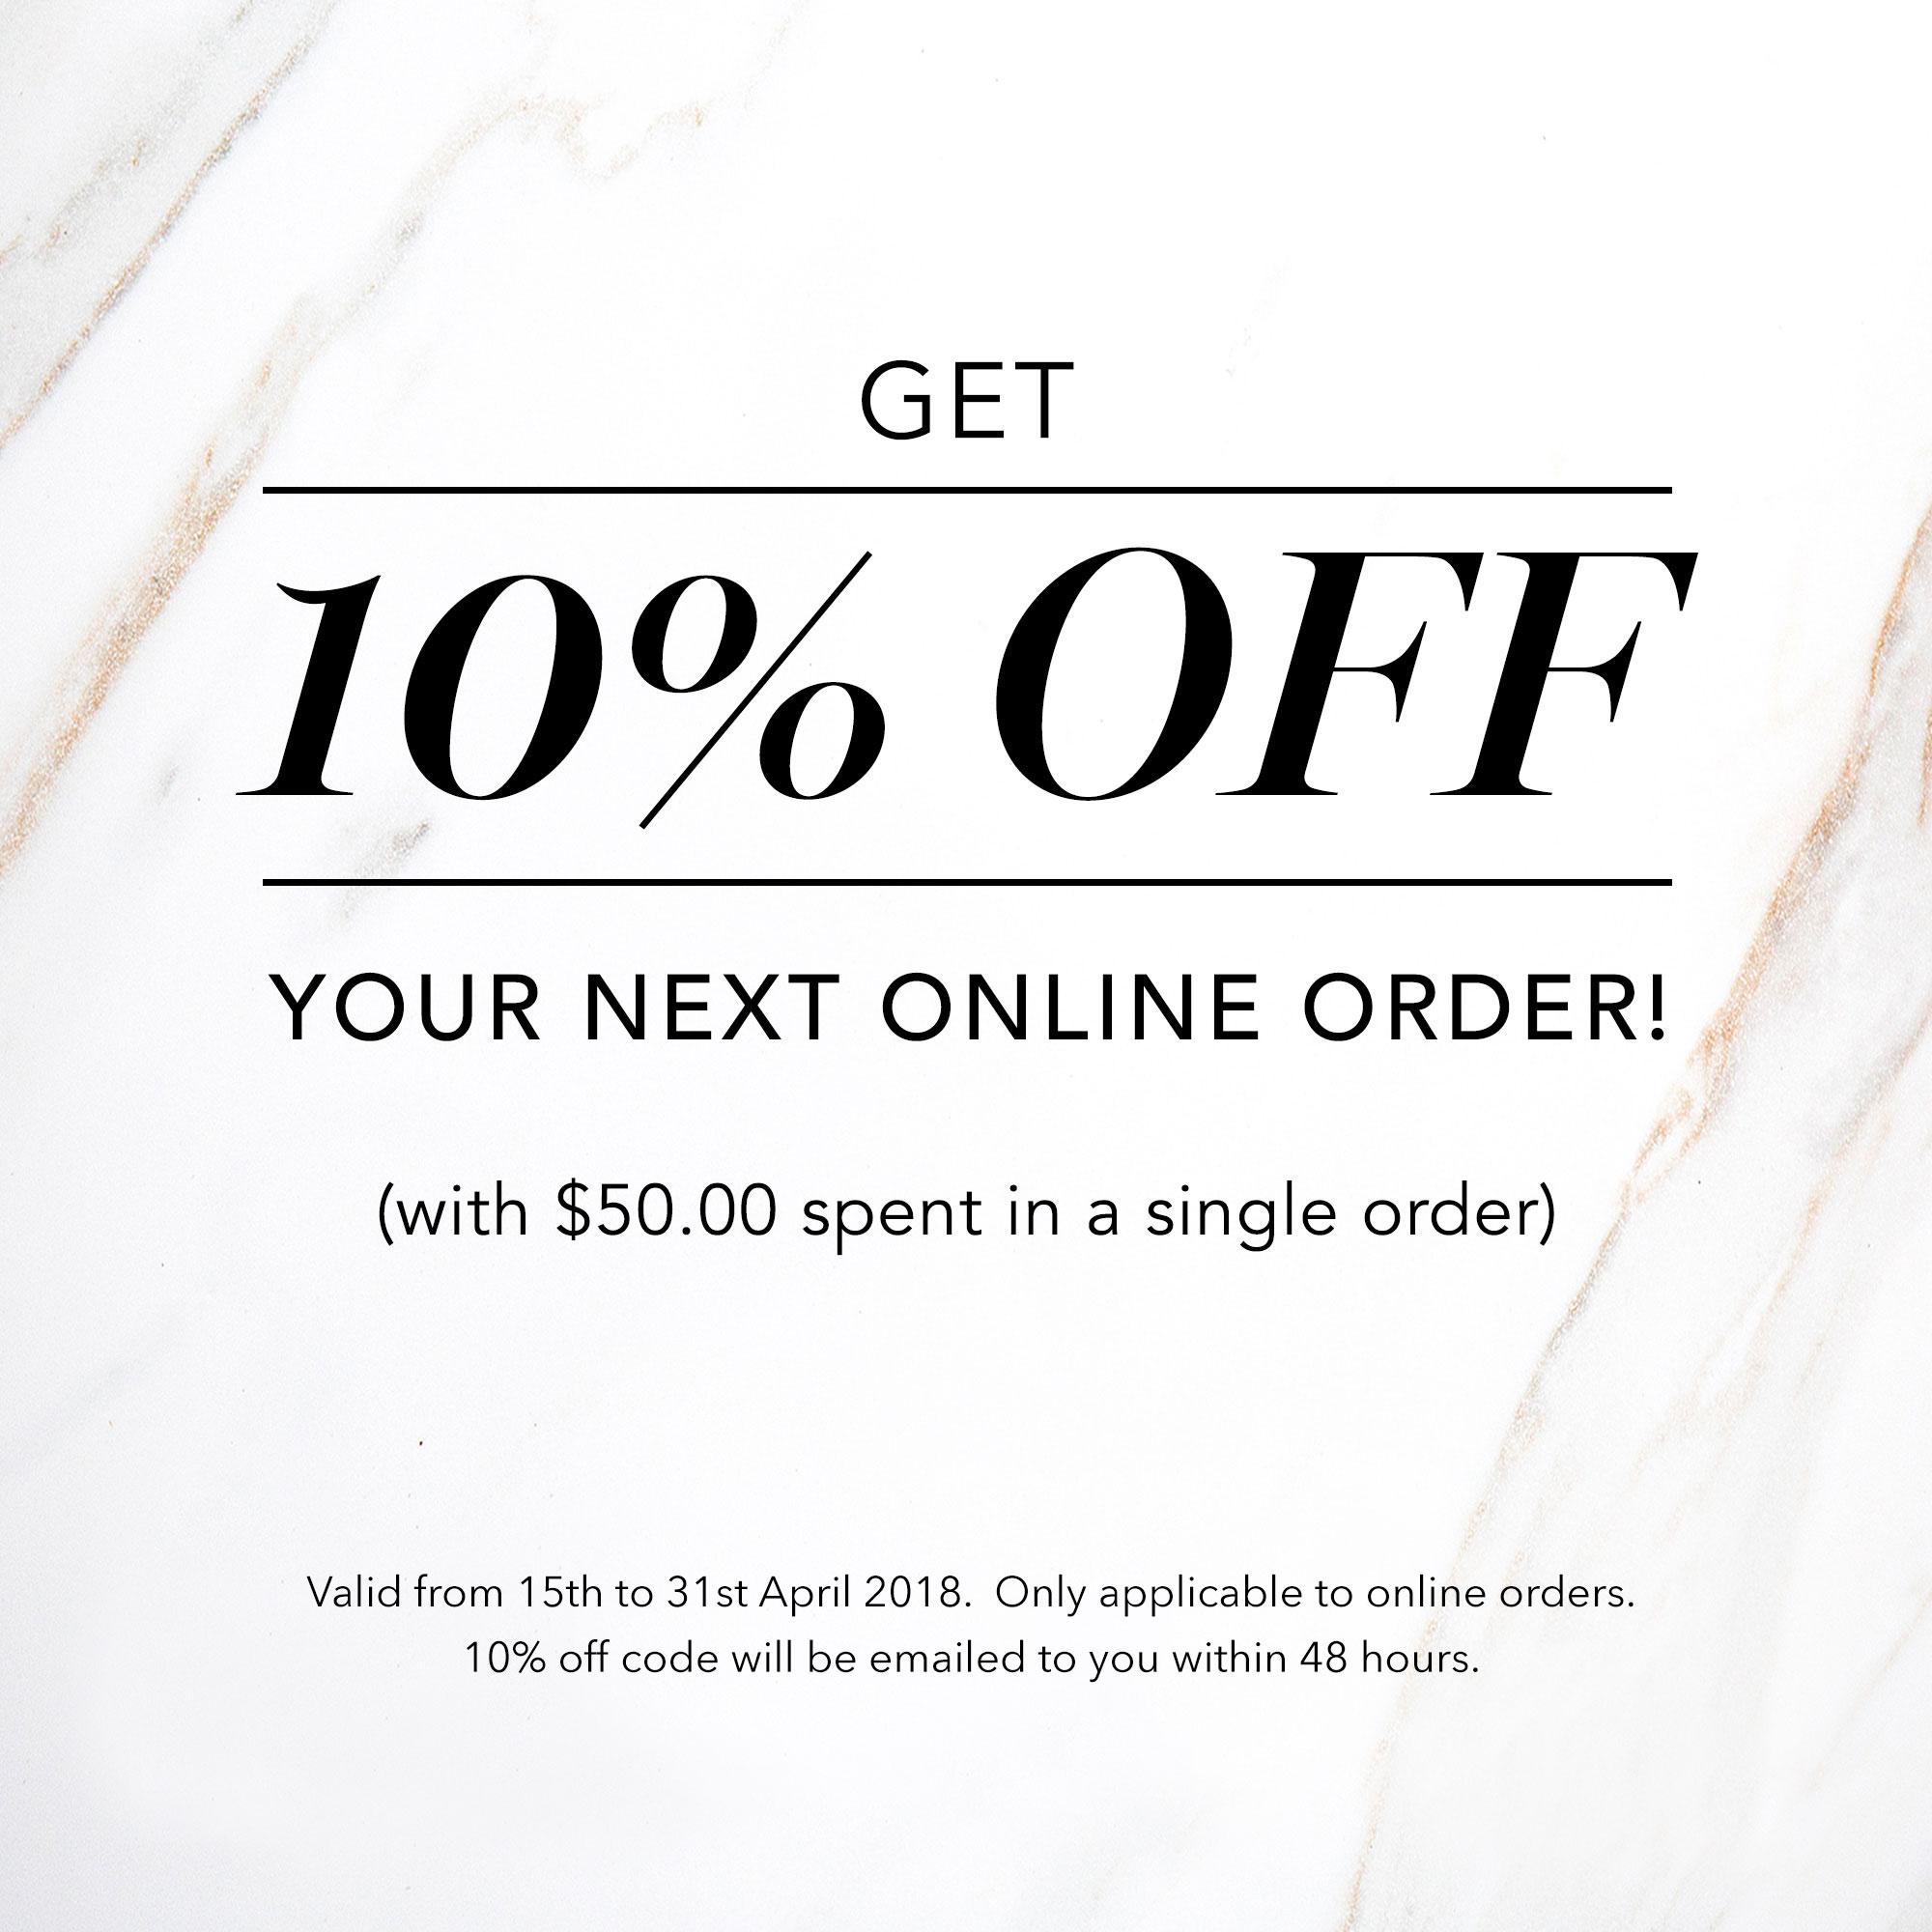 Get 10% off next order